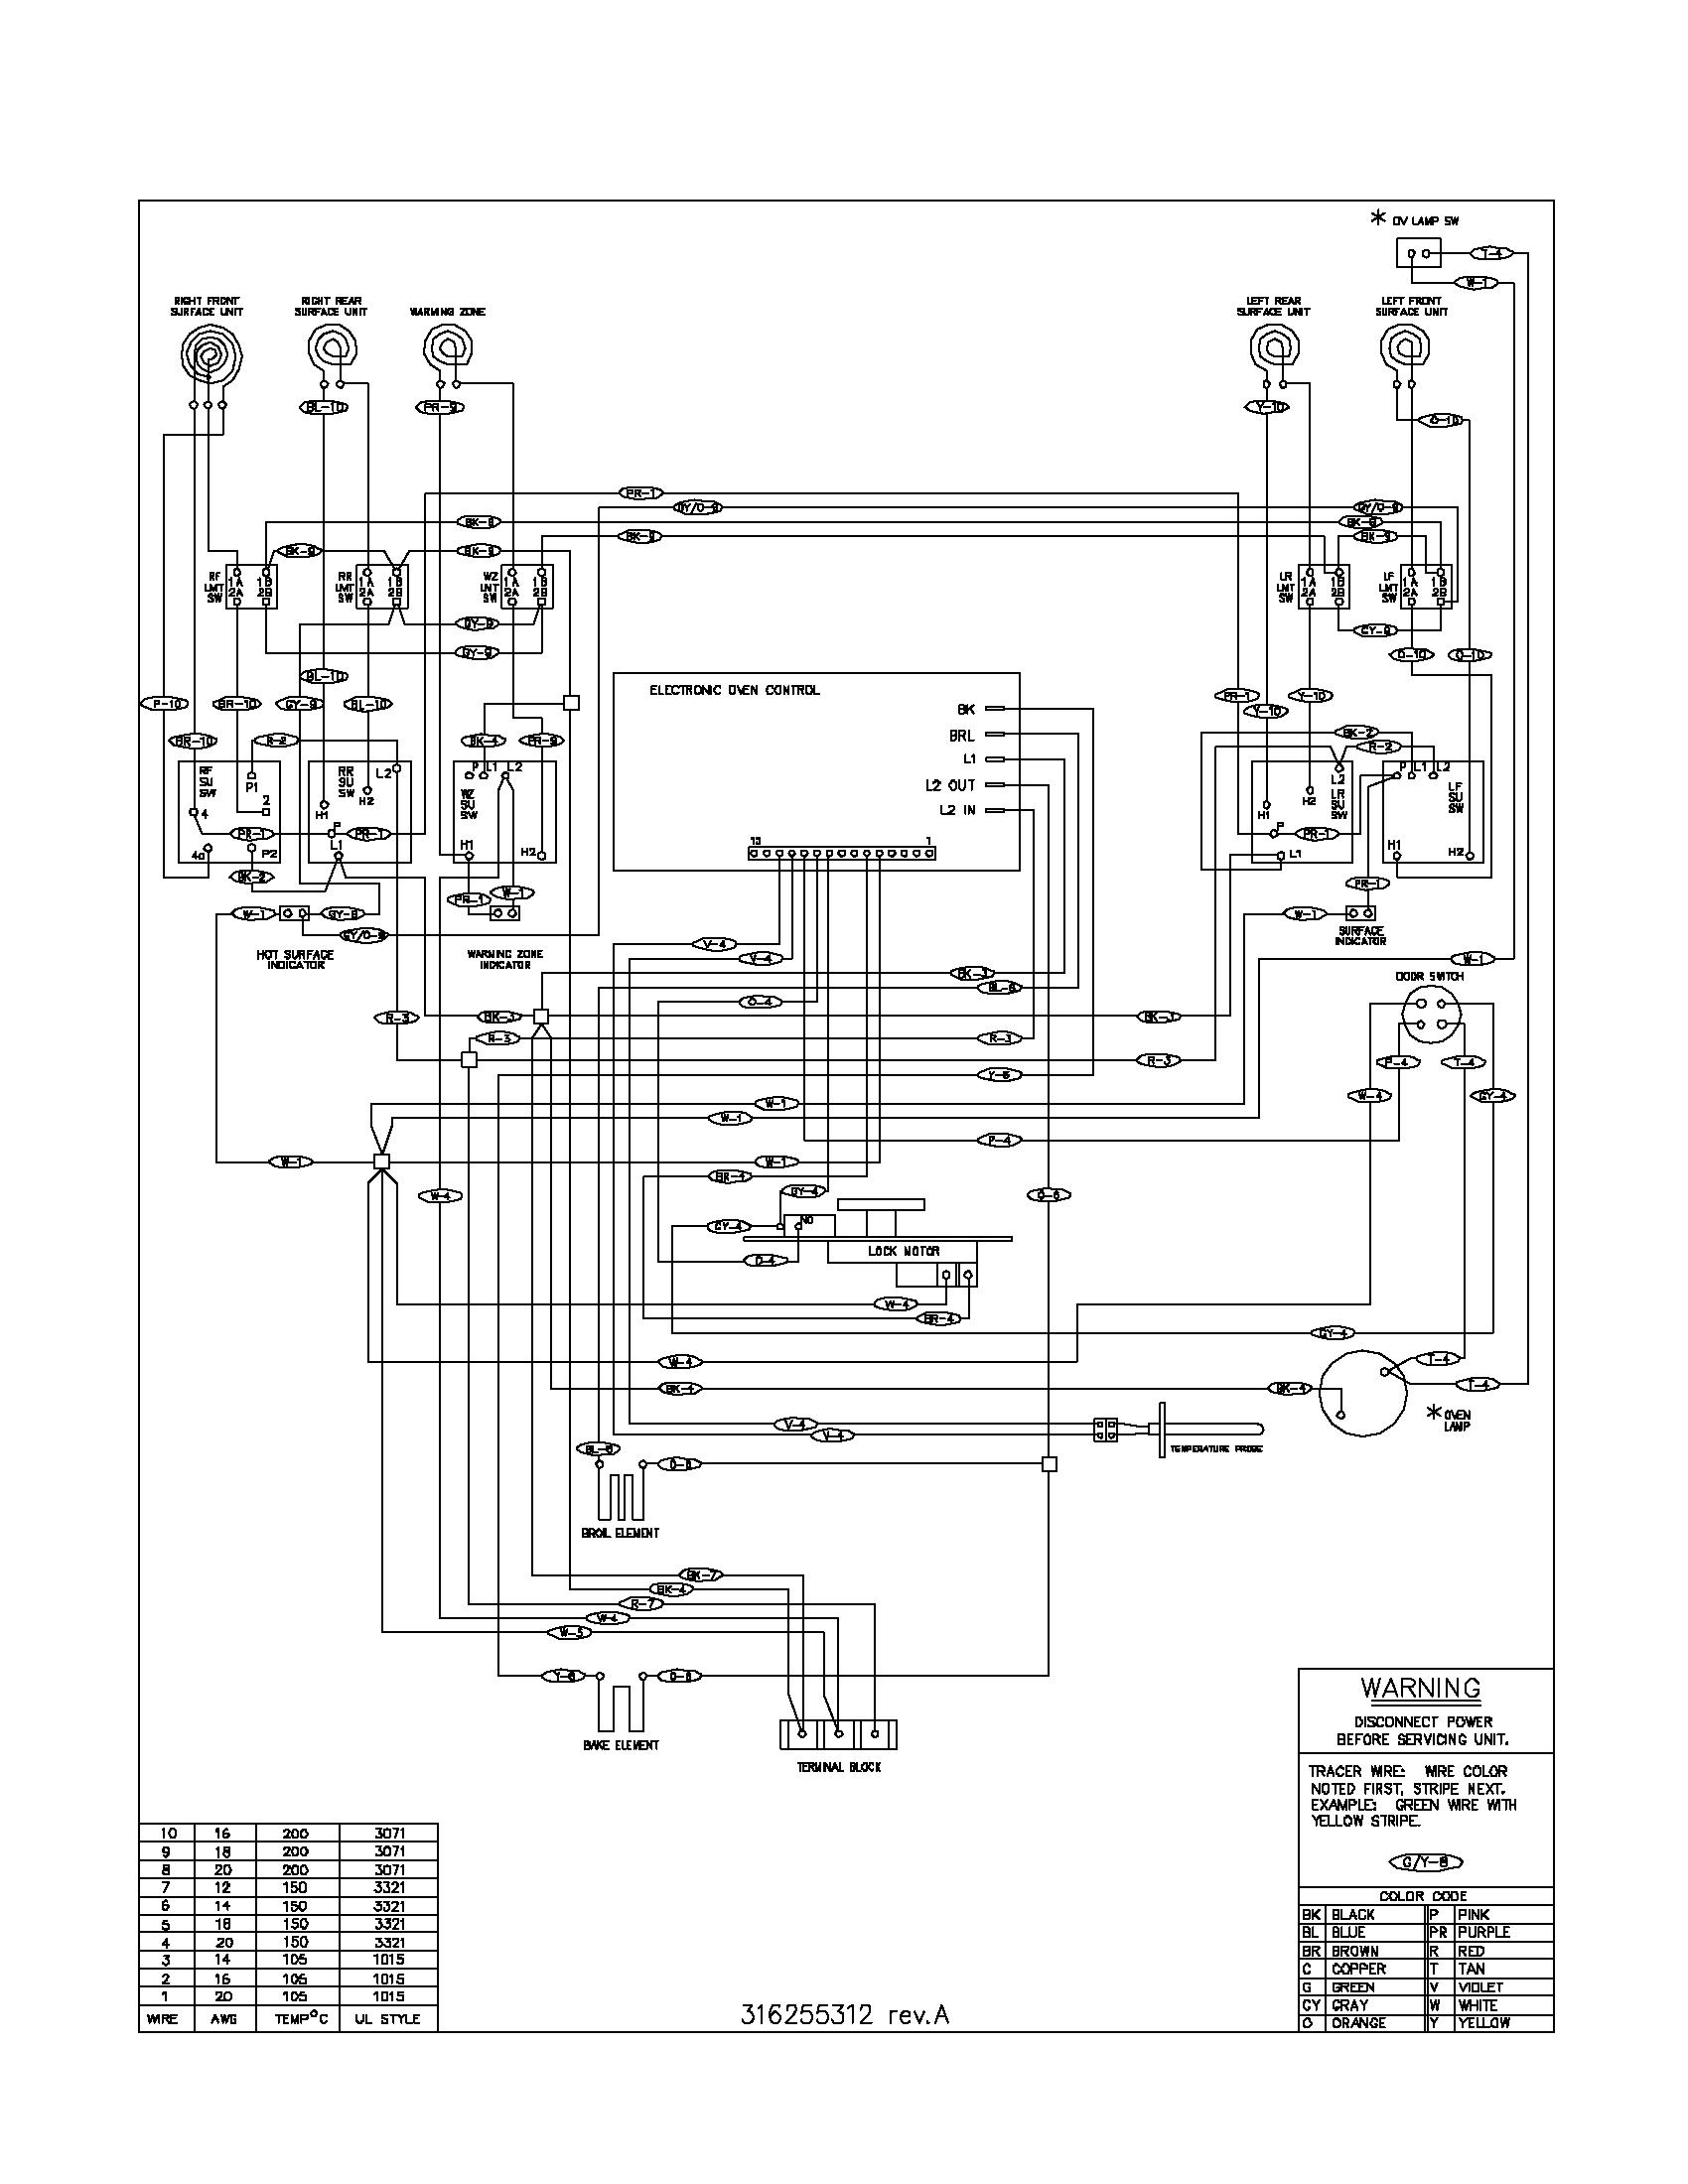 tg_3046] wiring diagram electric range free diagram  eumqu embo vish ungo sapebe mohammedshrine librar wiring 101